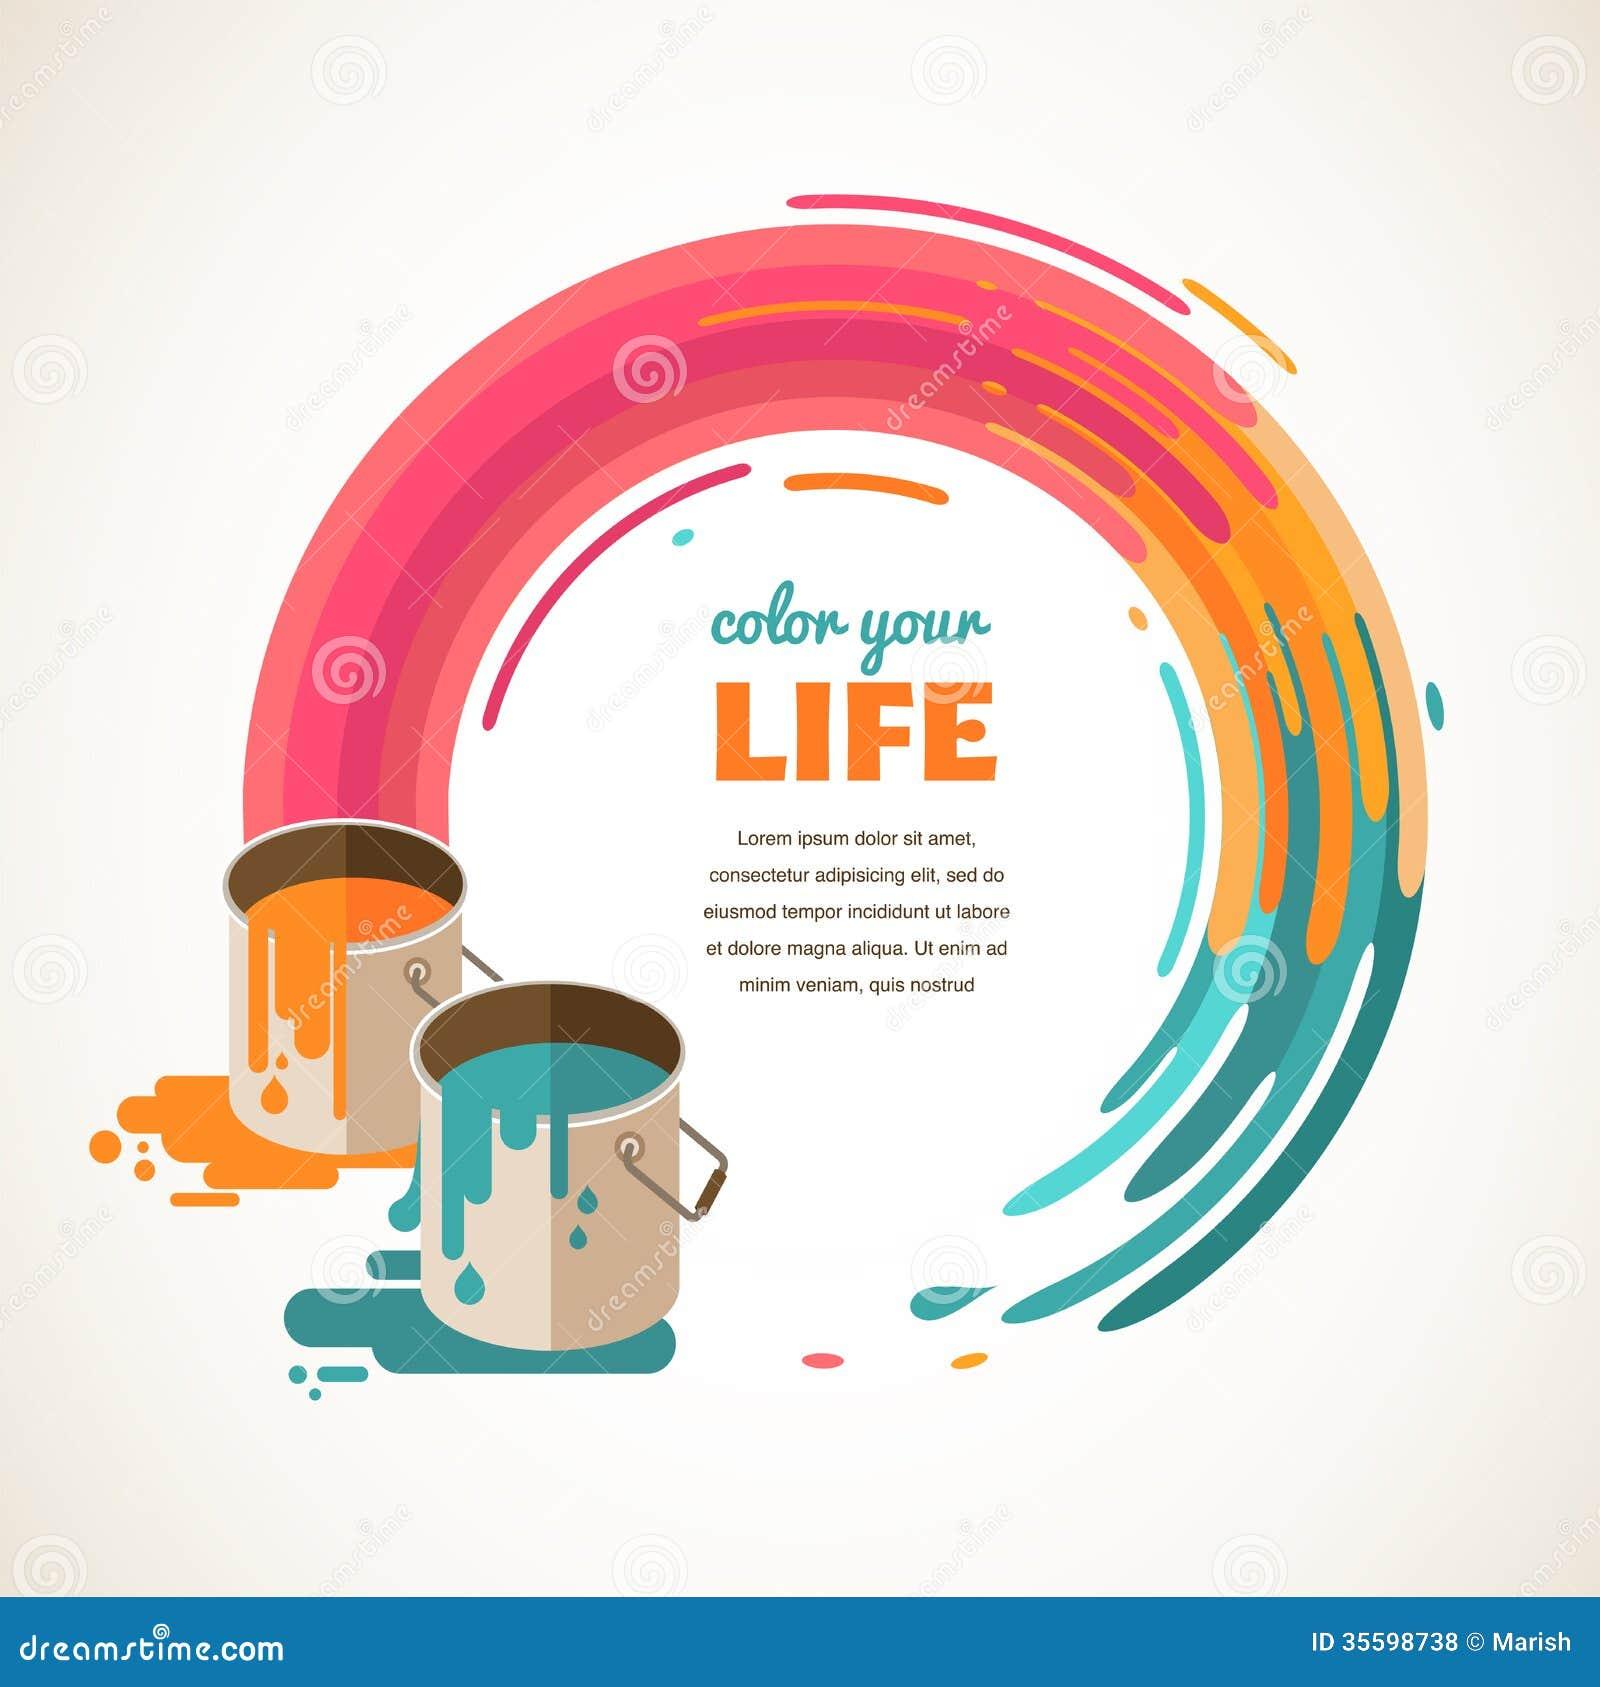 design creative idea and color concept royalty free